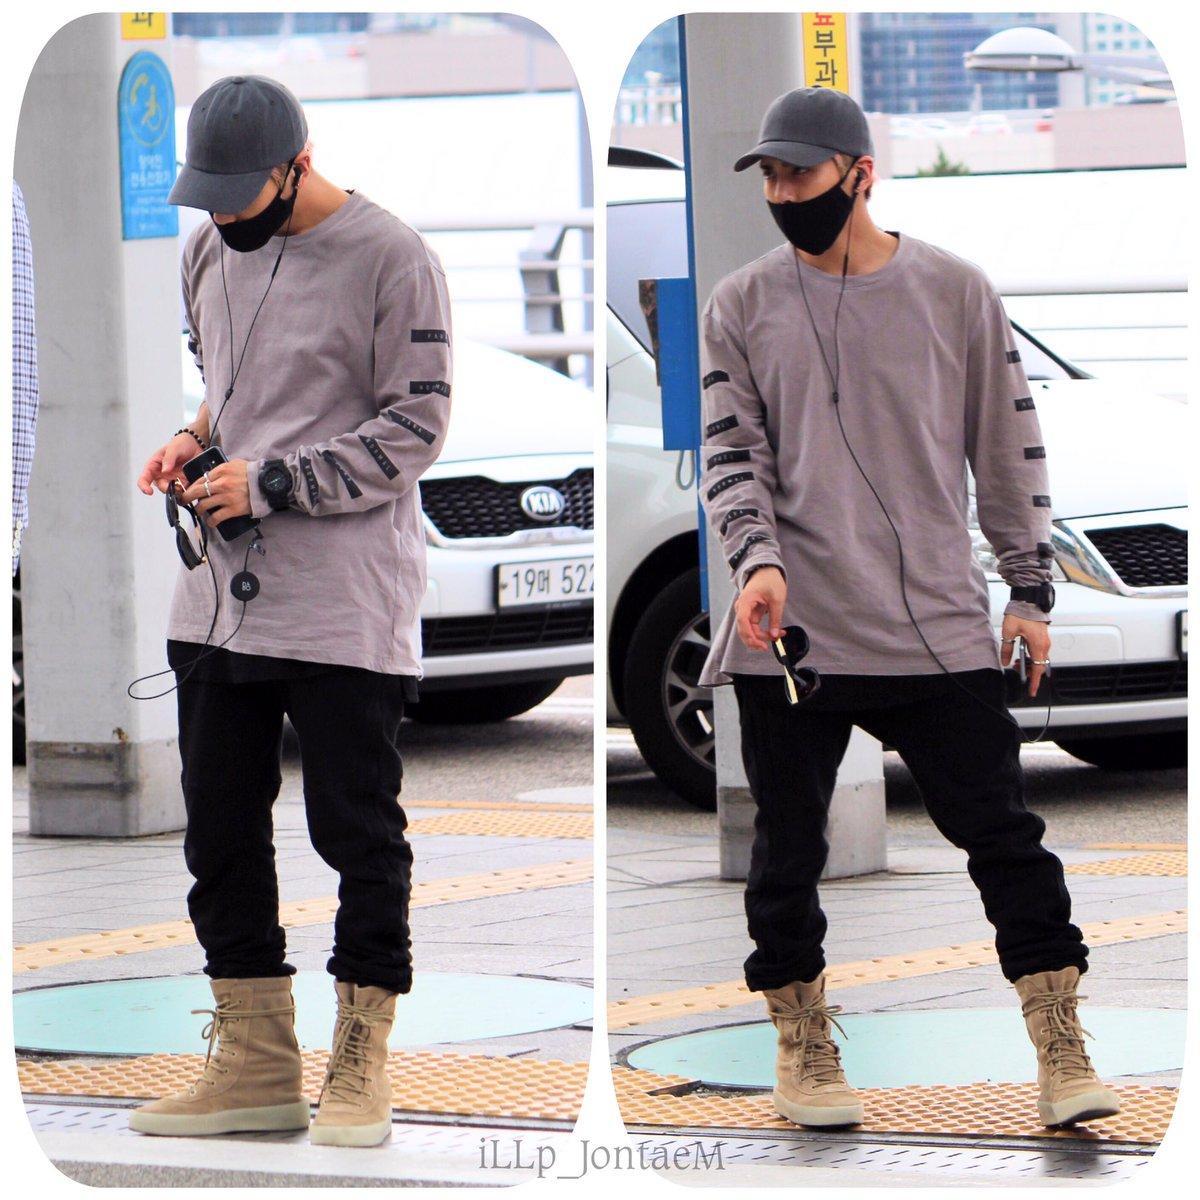 [IMG/160715] Jonghyun, Key @ Aeropuerto Incheon hacia Japón. KCMc4gOl